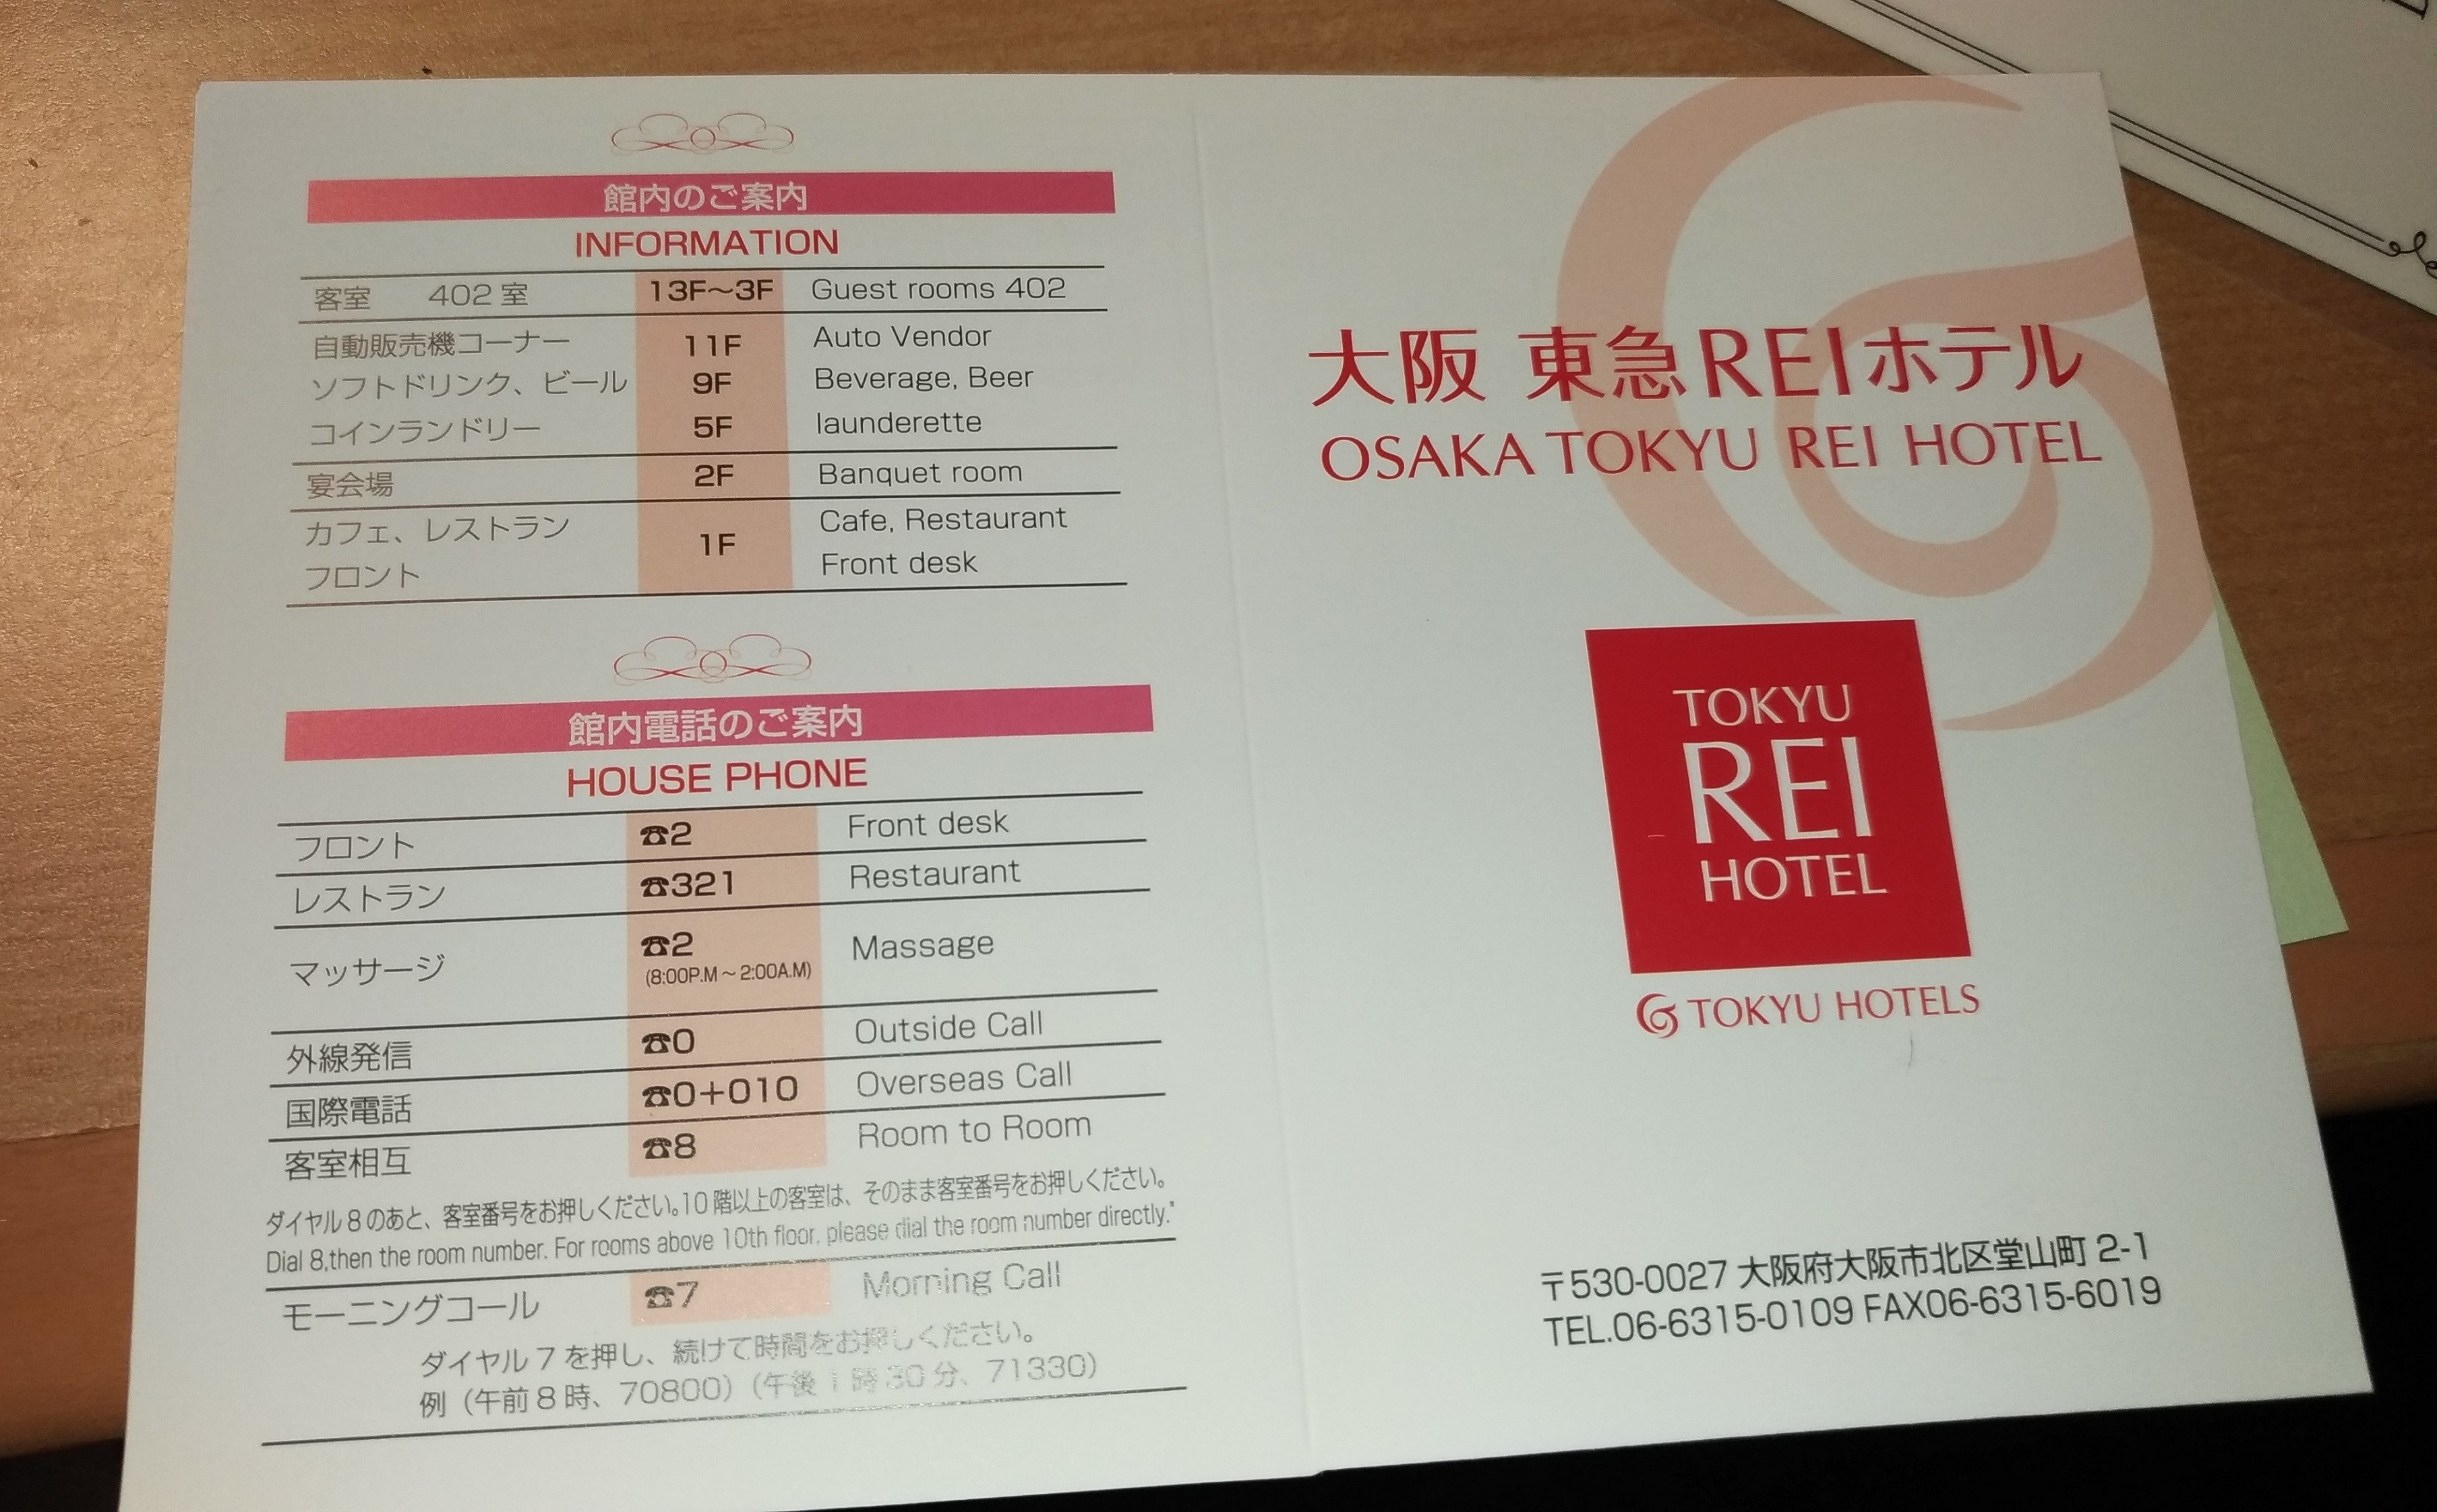 osaka_umeda_tokyu_rei_hotel_0917_reviews.jpg